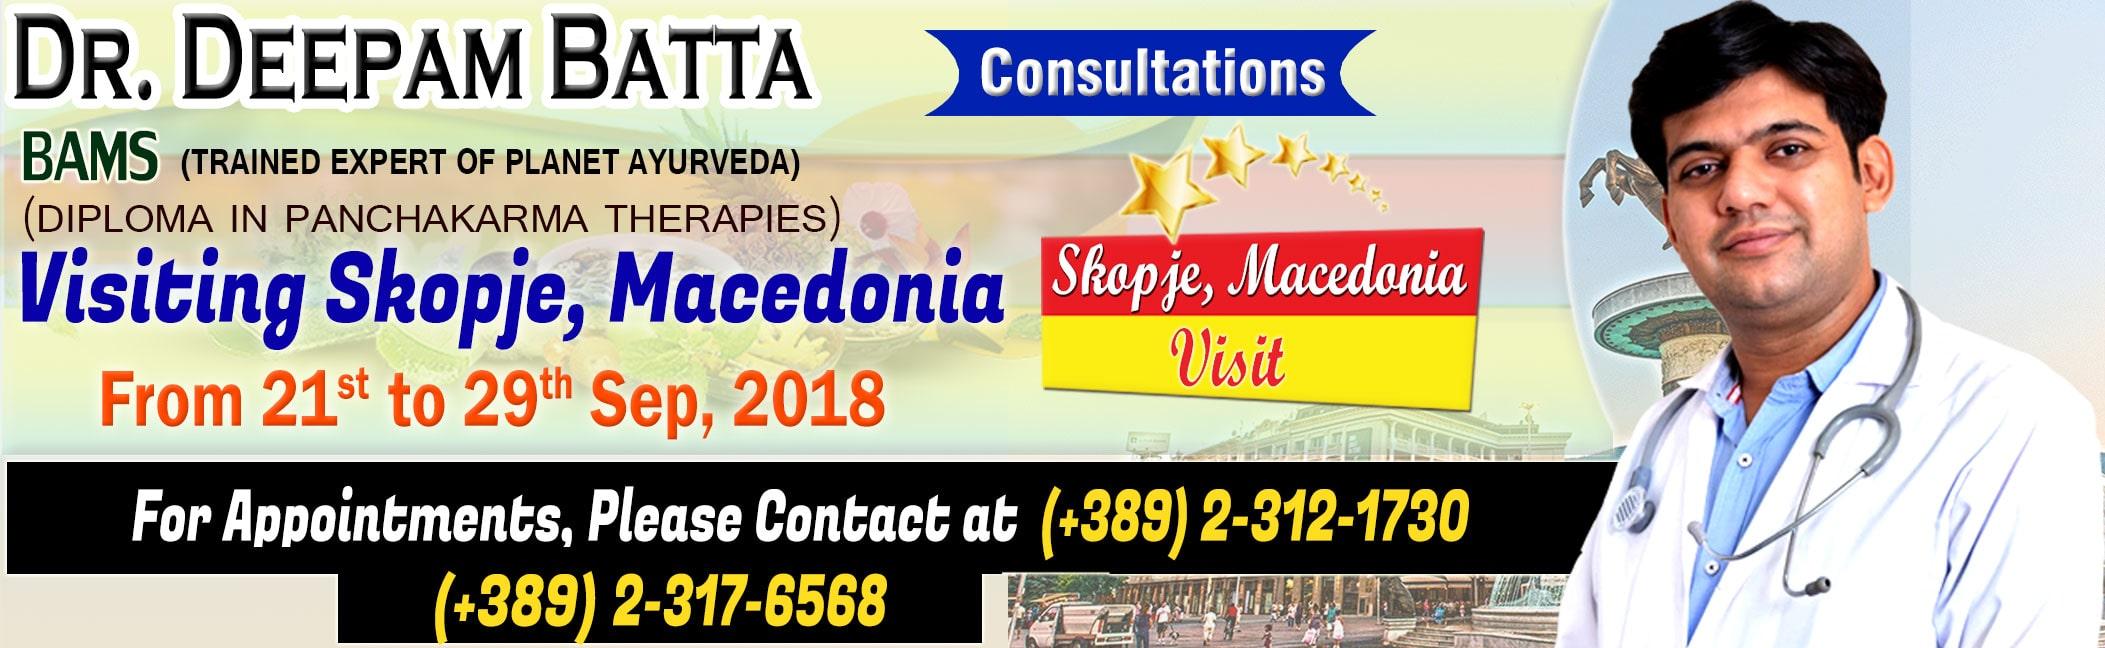 ayurvedic treatment, ayurvedic consultations, macedonia, skopje, Dr Deepam Batta events